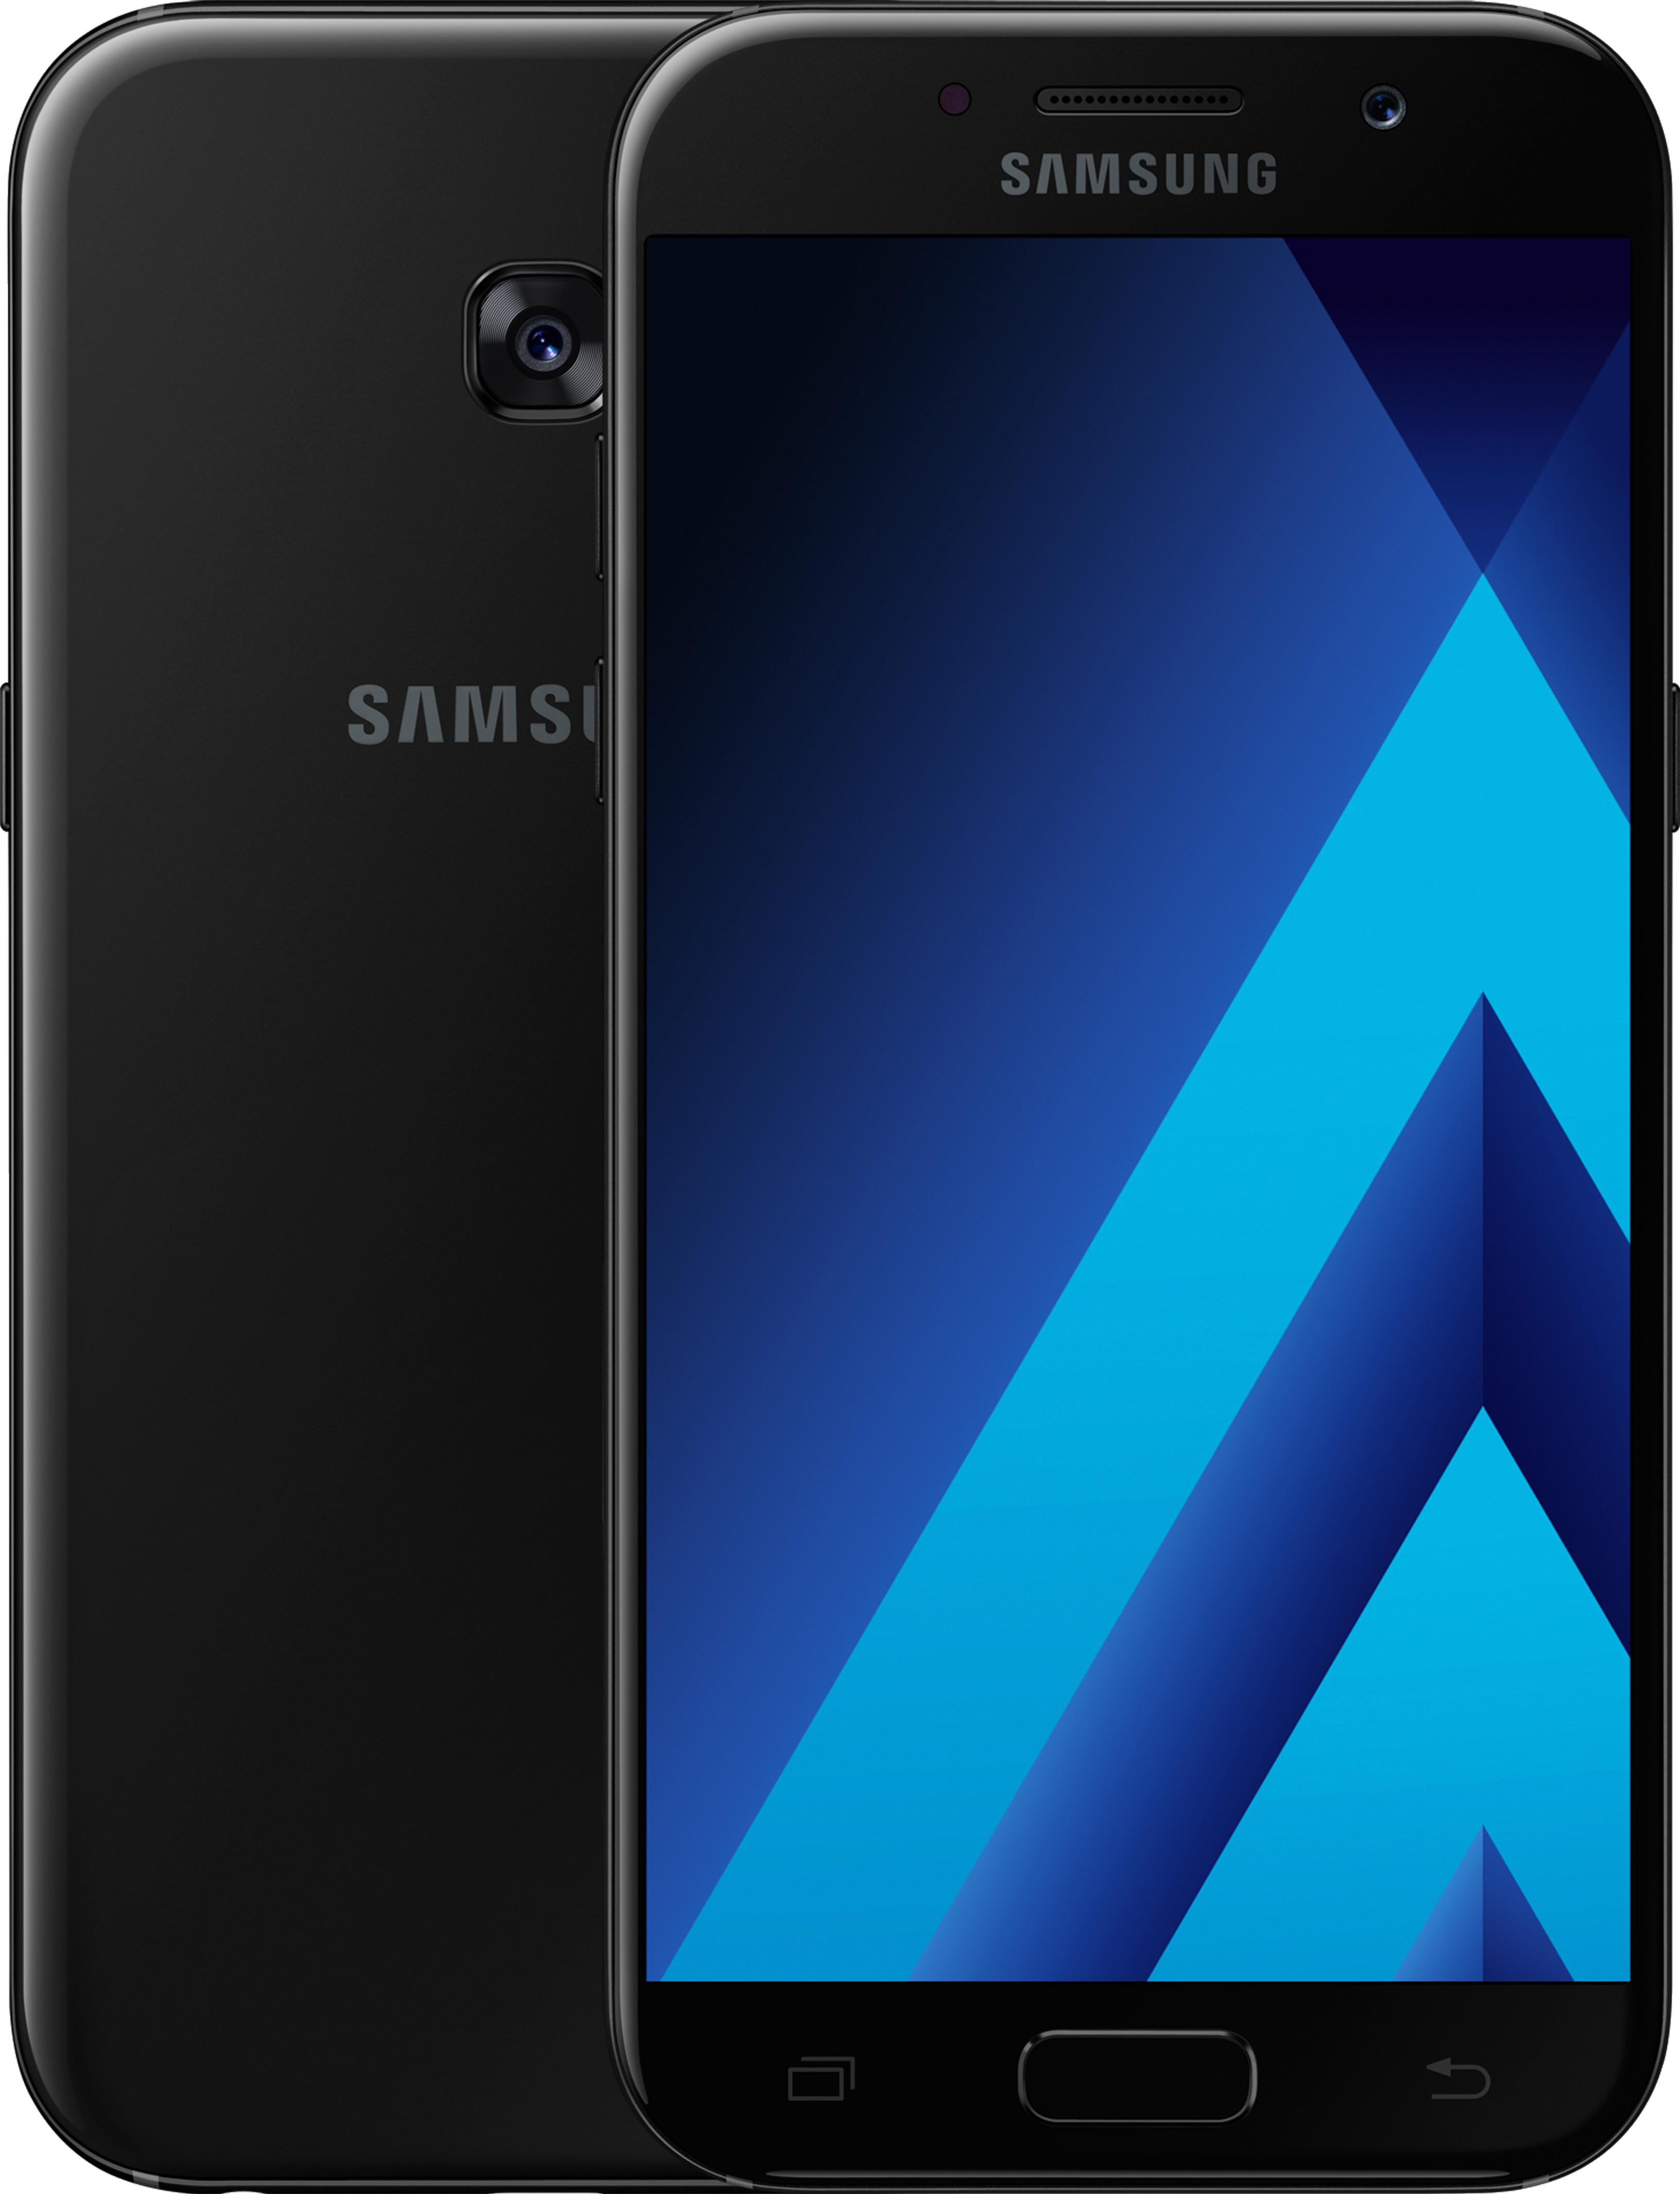 Reparatie Galaxy A5 (2017)scherm reparatie